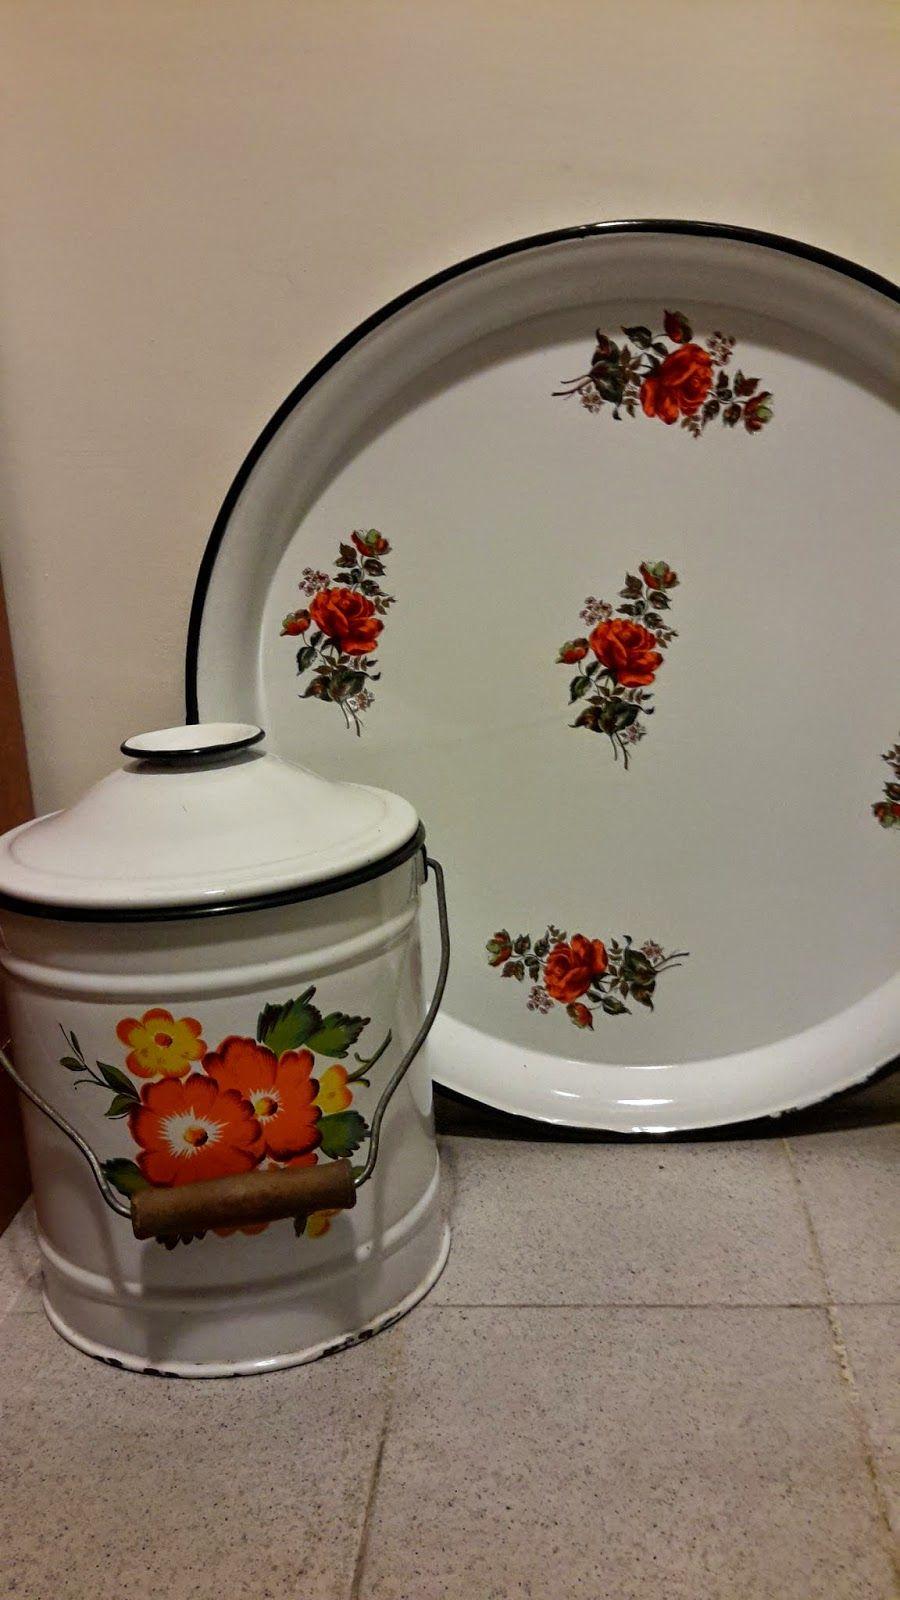 Derya kuzusu. Cookie jar and matching plate.